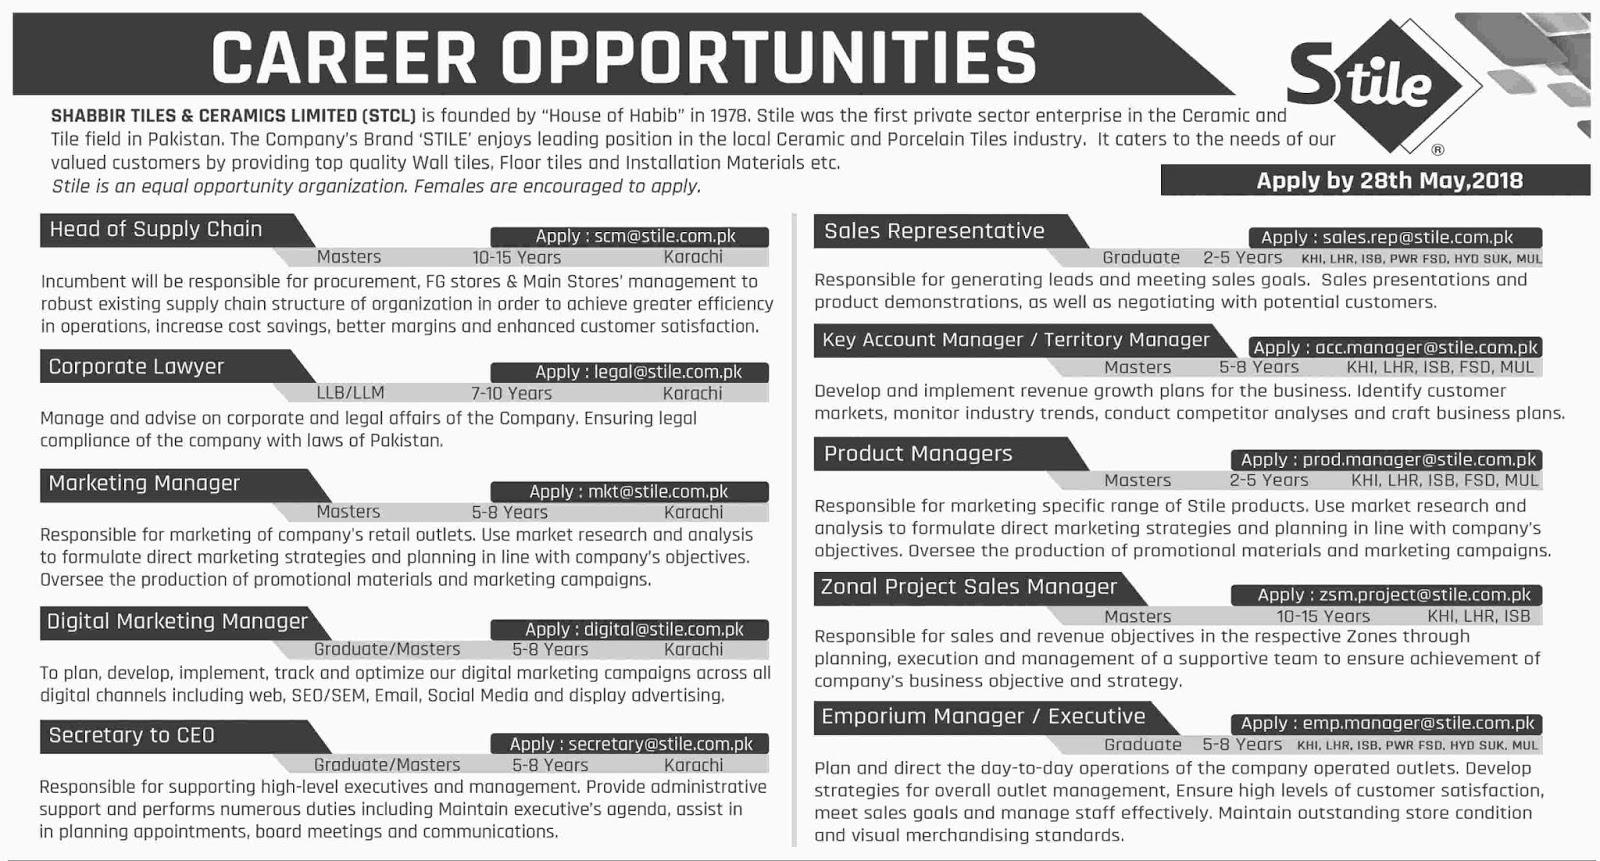 karachi-jobs